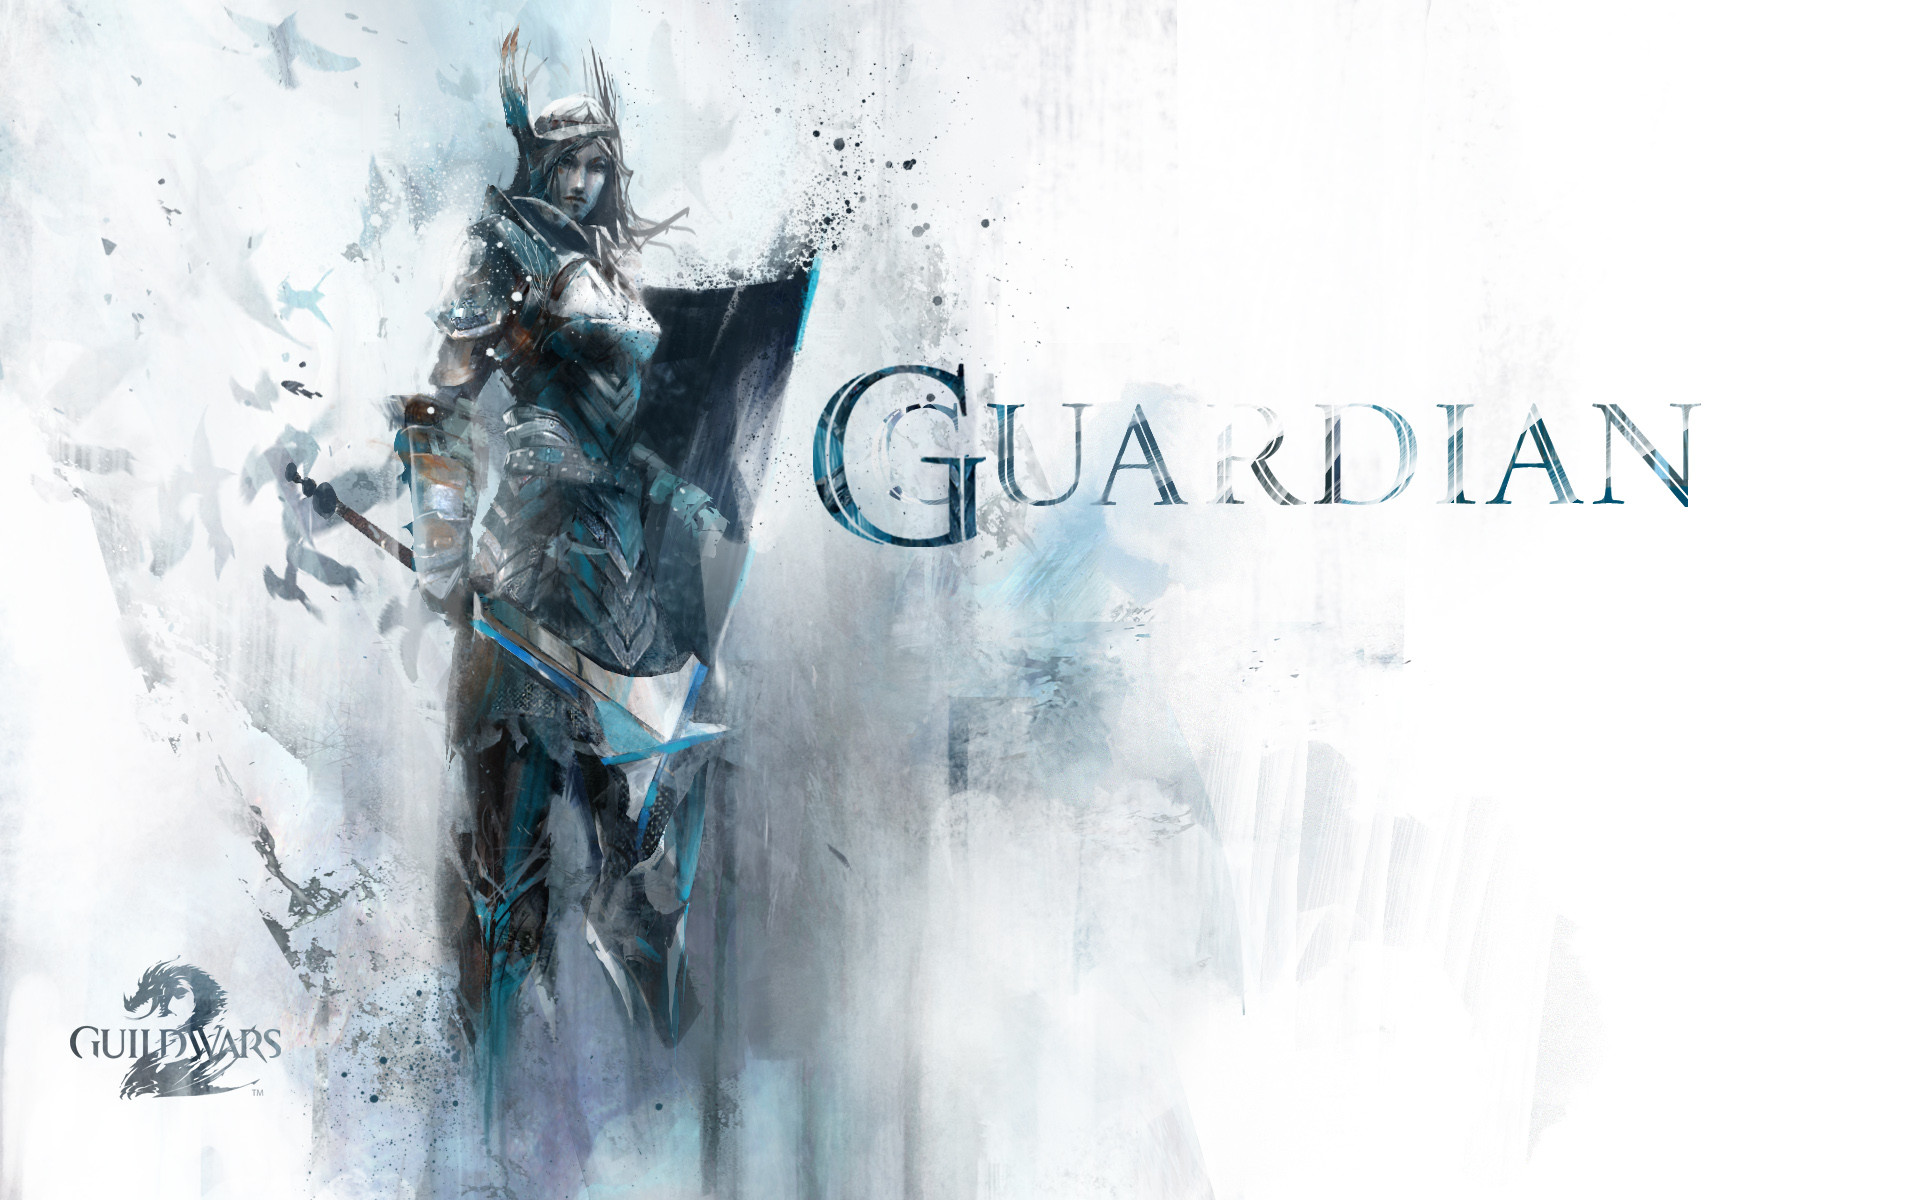 Guild Wars 2 Guardian Wallpaper Wallpapertag